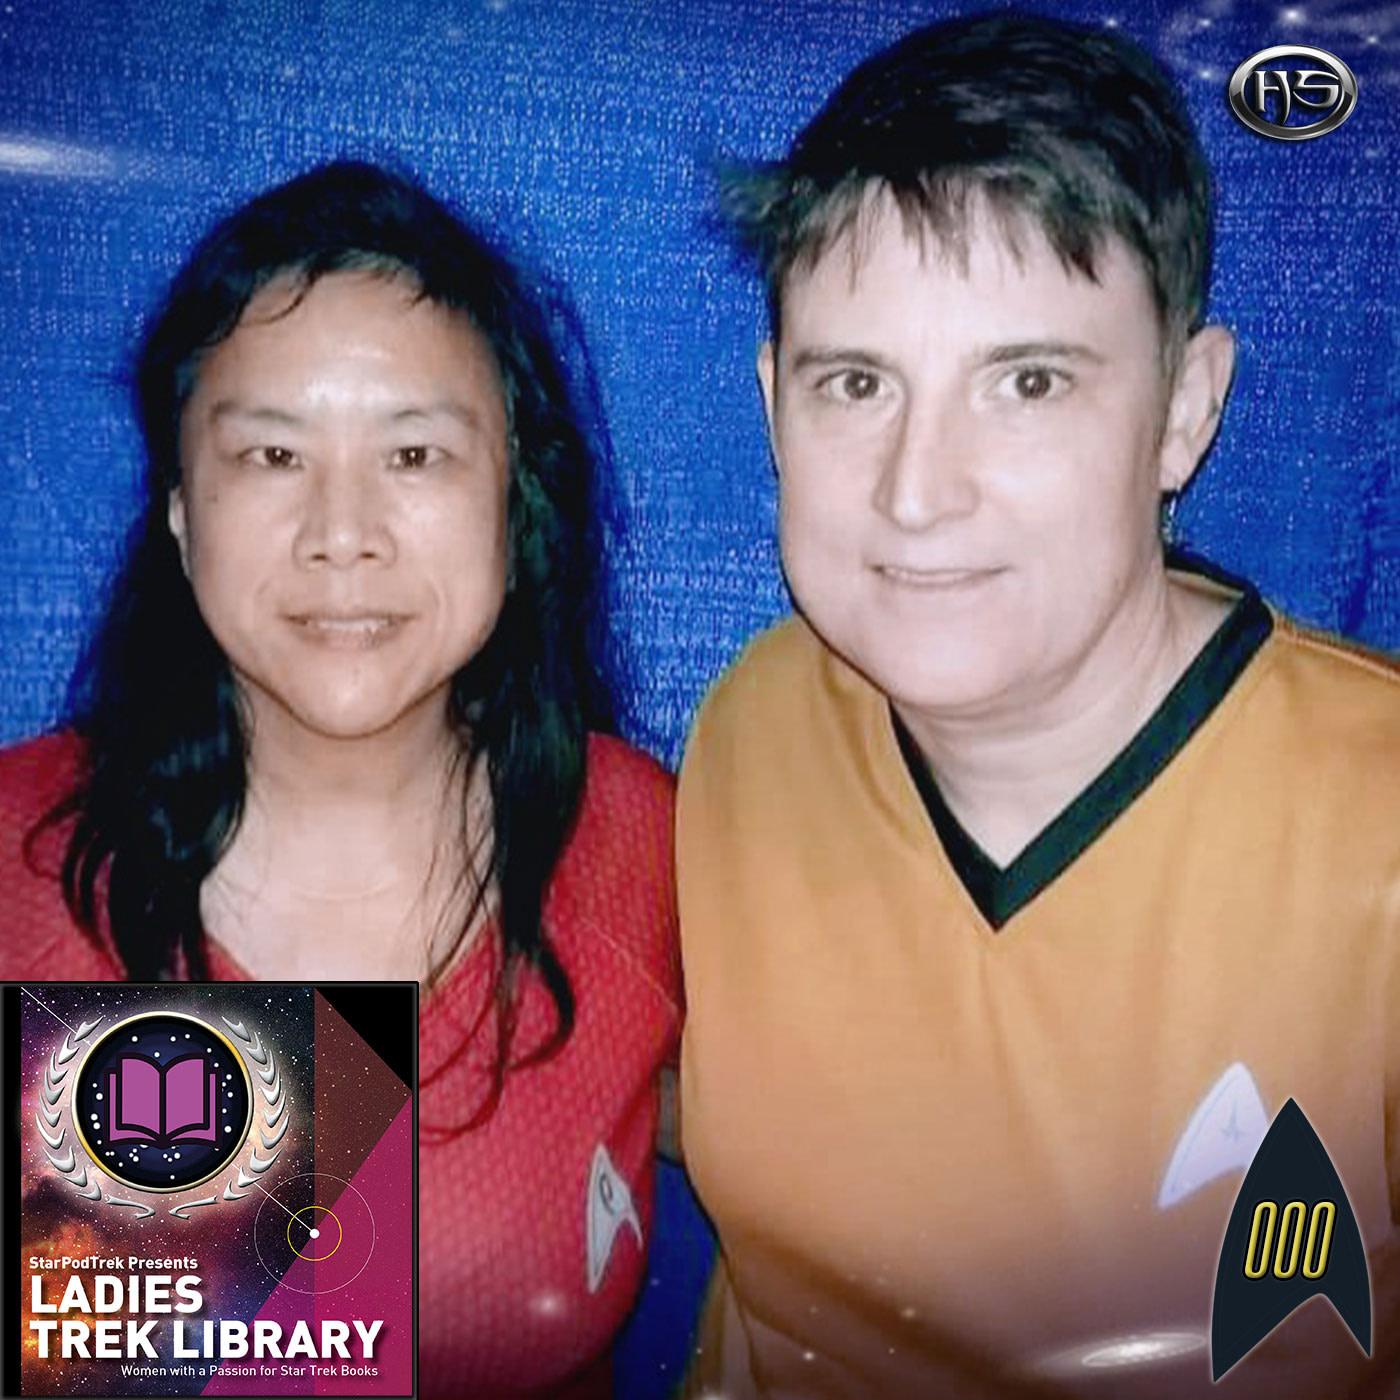 Ladies Trek Library Episode 0